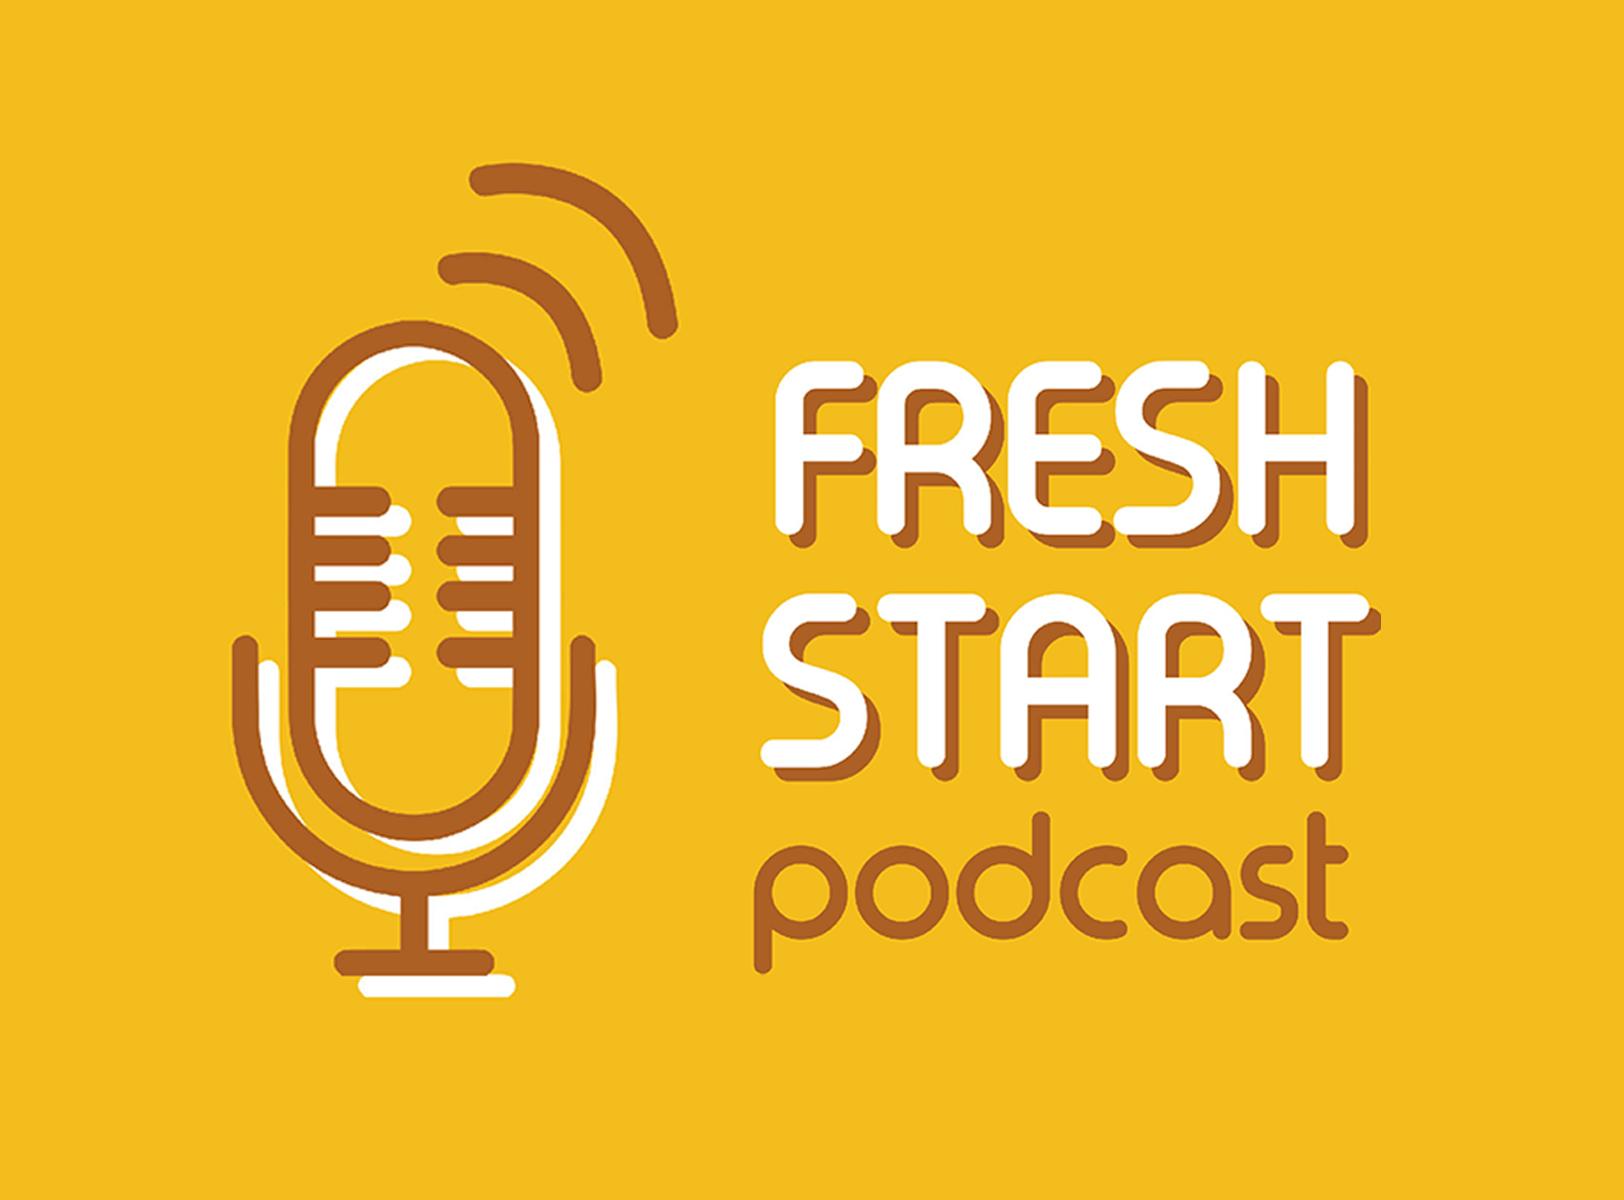 Fresh Start: Podcast News (9/4/2018 Tue.)